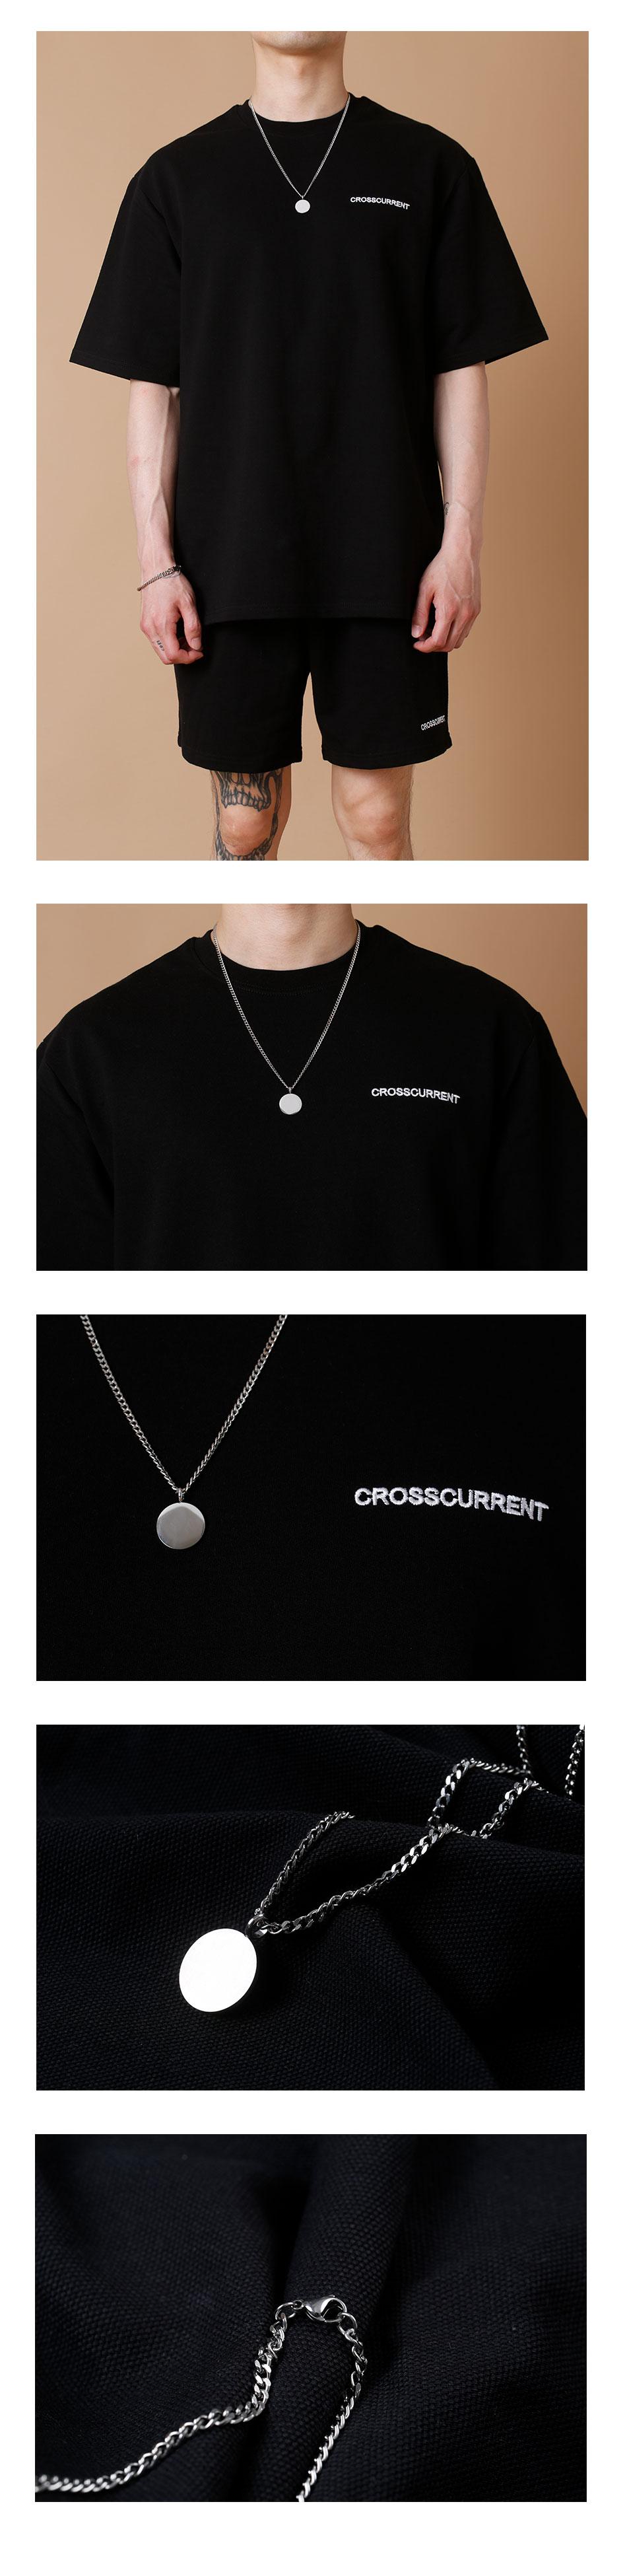 #crct00007-CCT-Circle-Chain-Necklace950.jpg